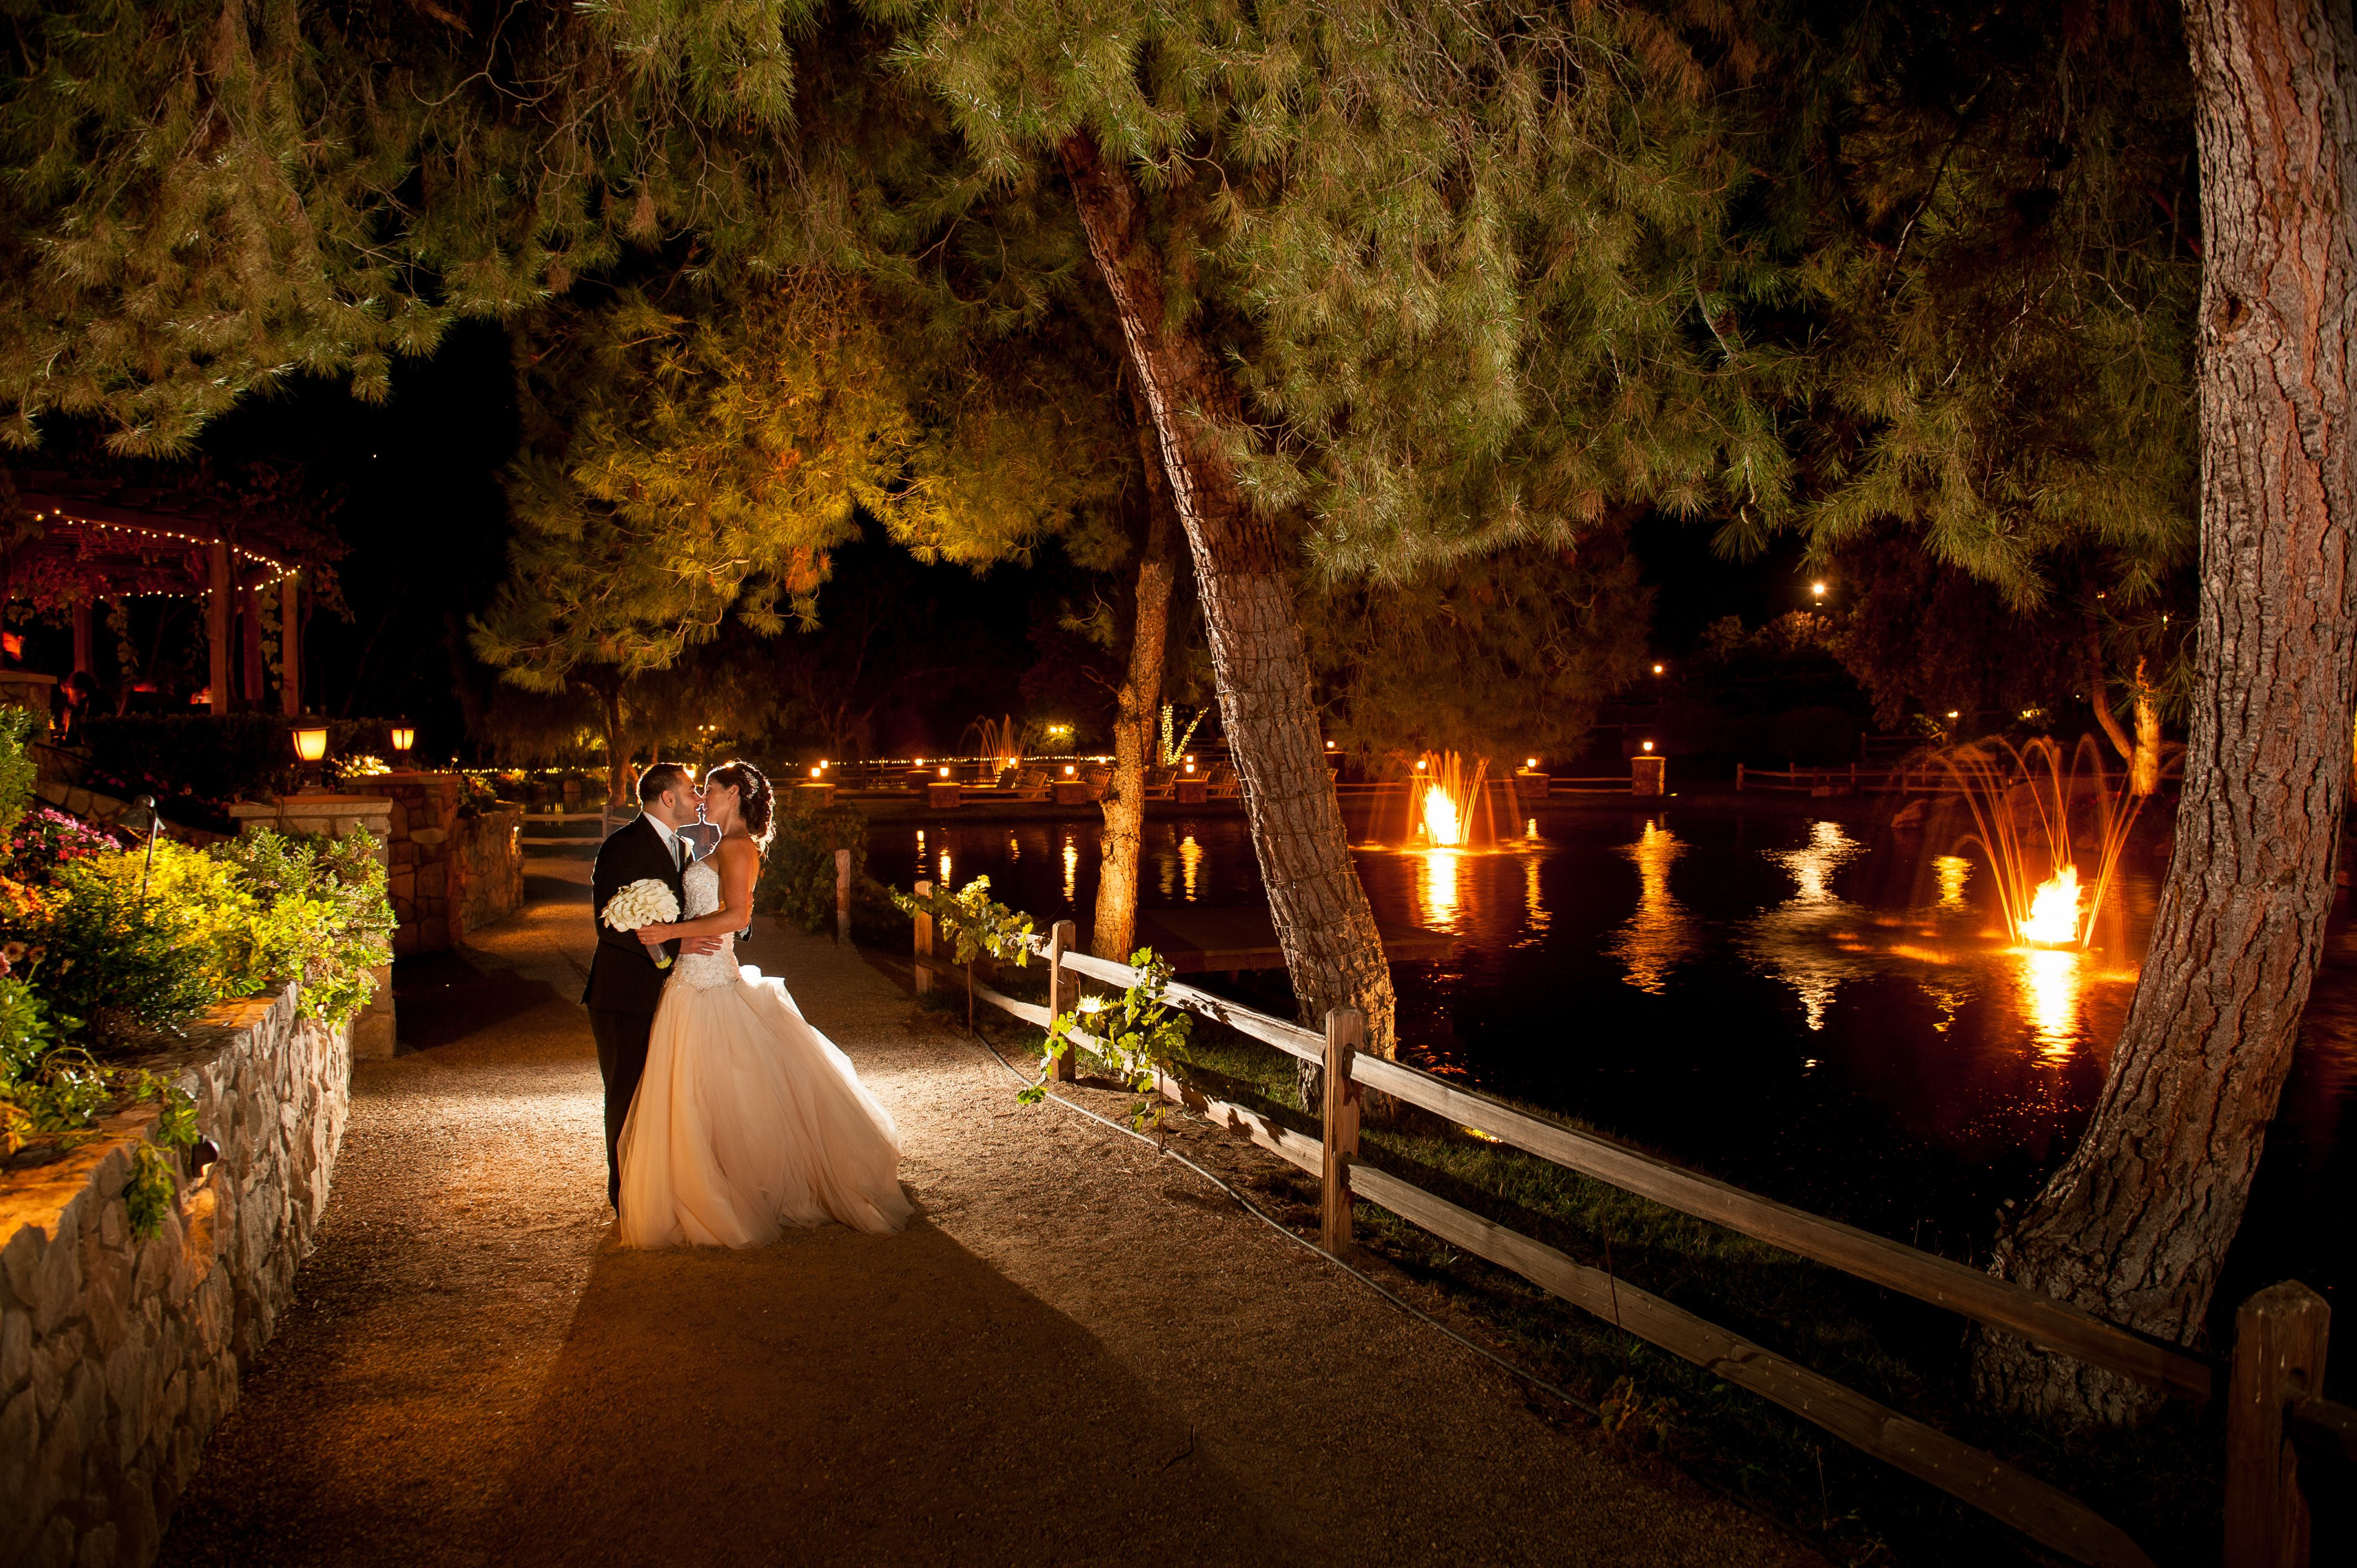 Lake oak meadows weddings and events california wedding